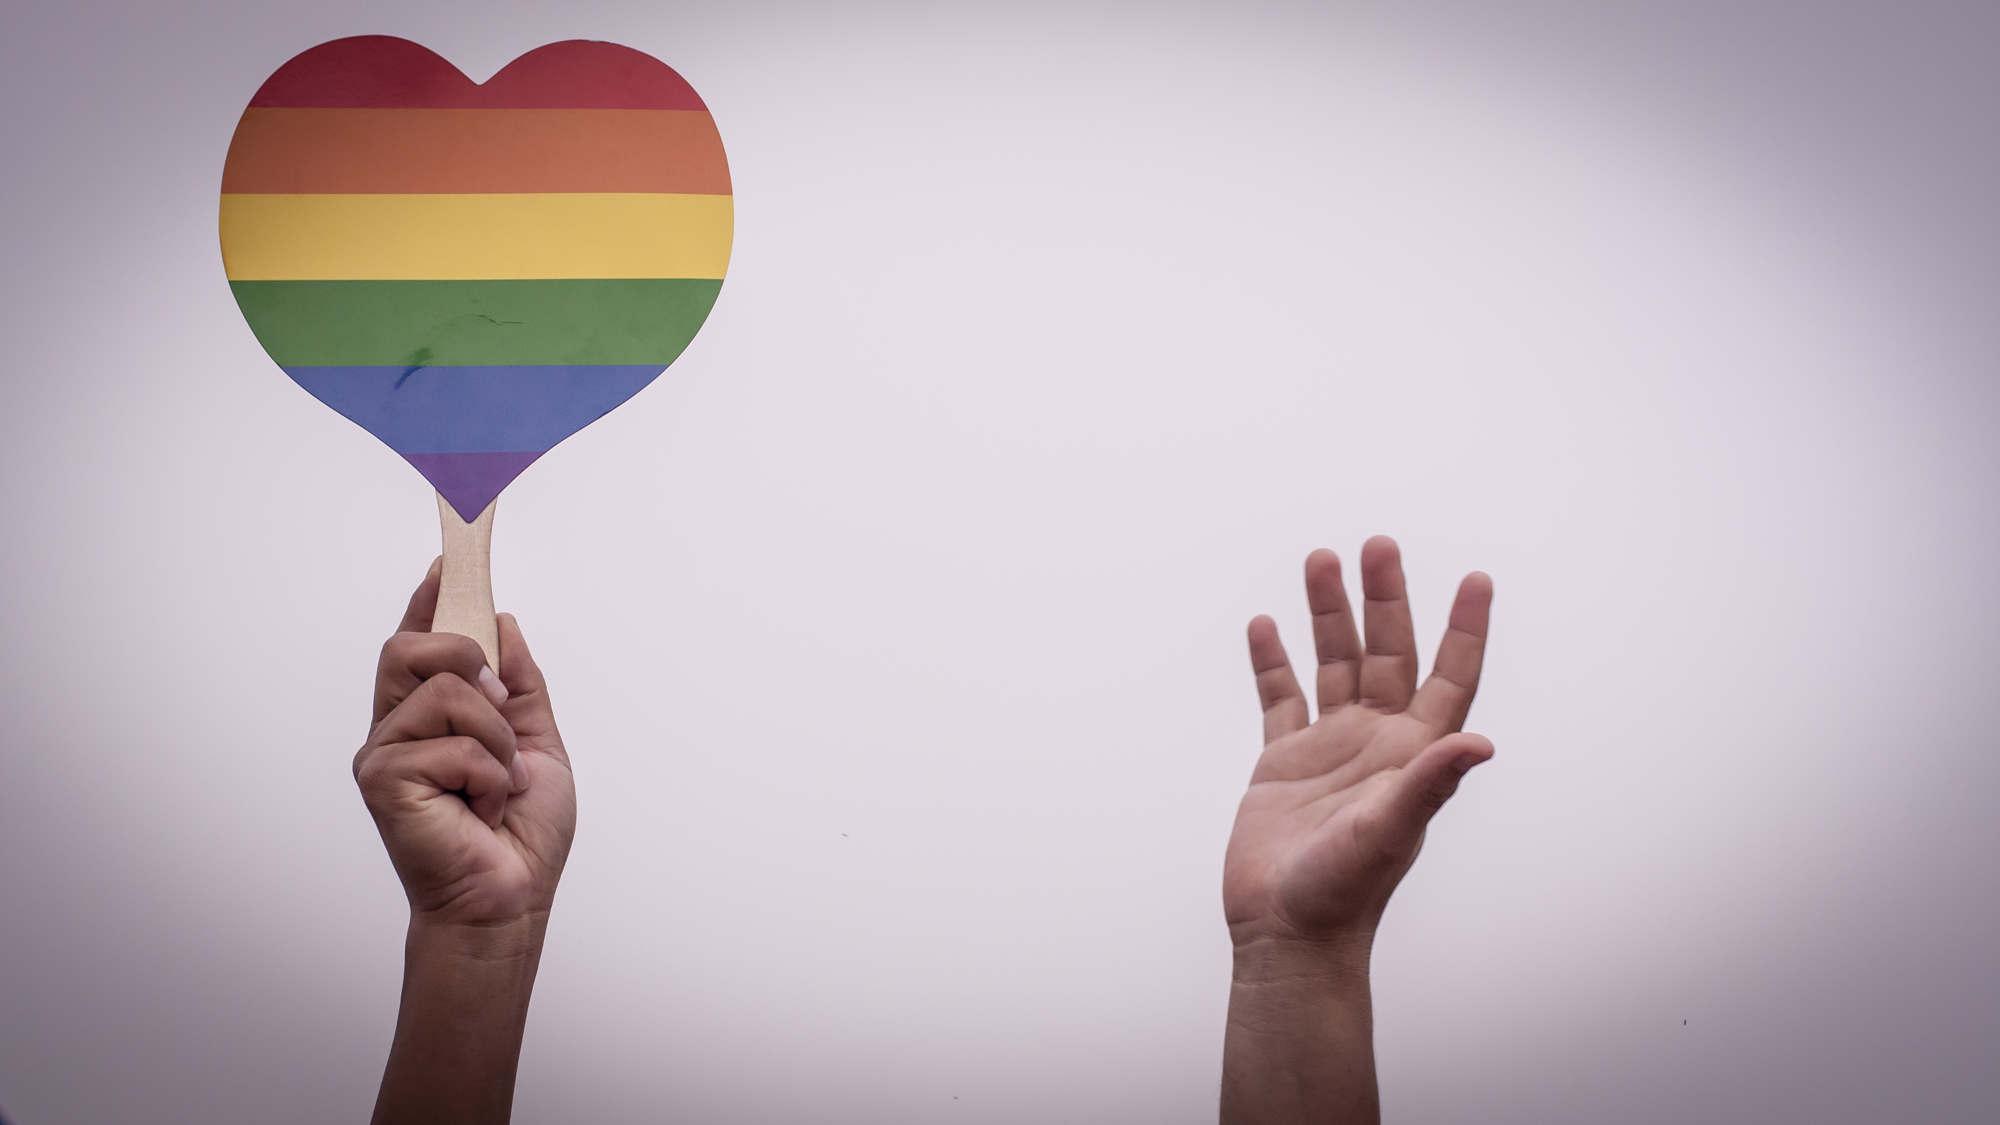 Esta Asamblea Legislativa no podrá prohibir el matrimonio igualitario